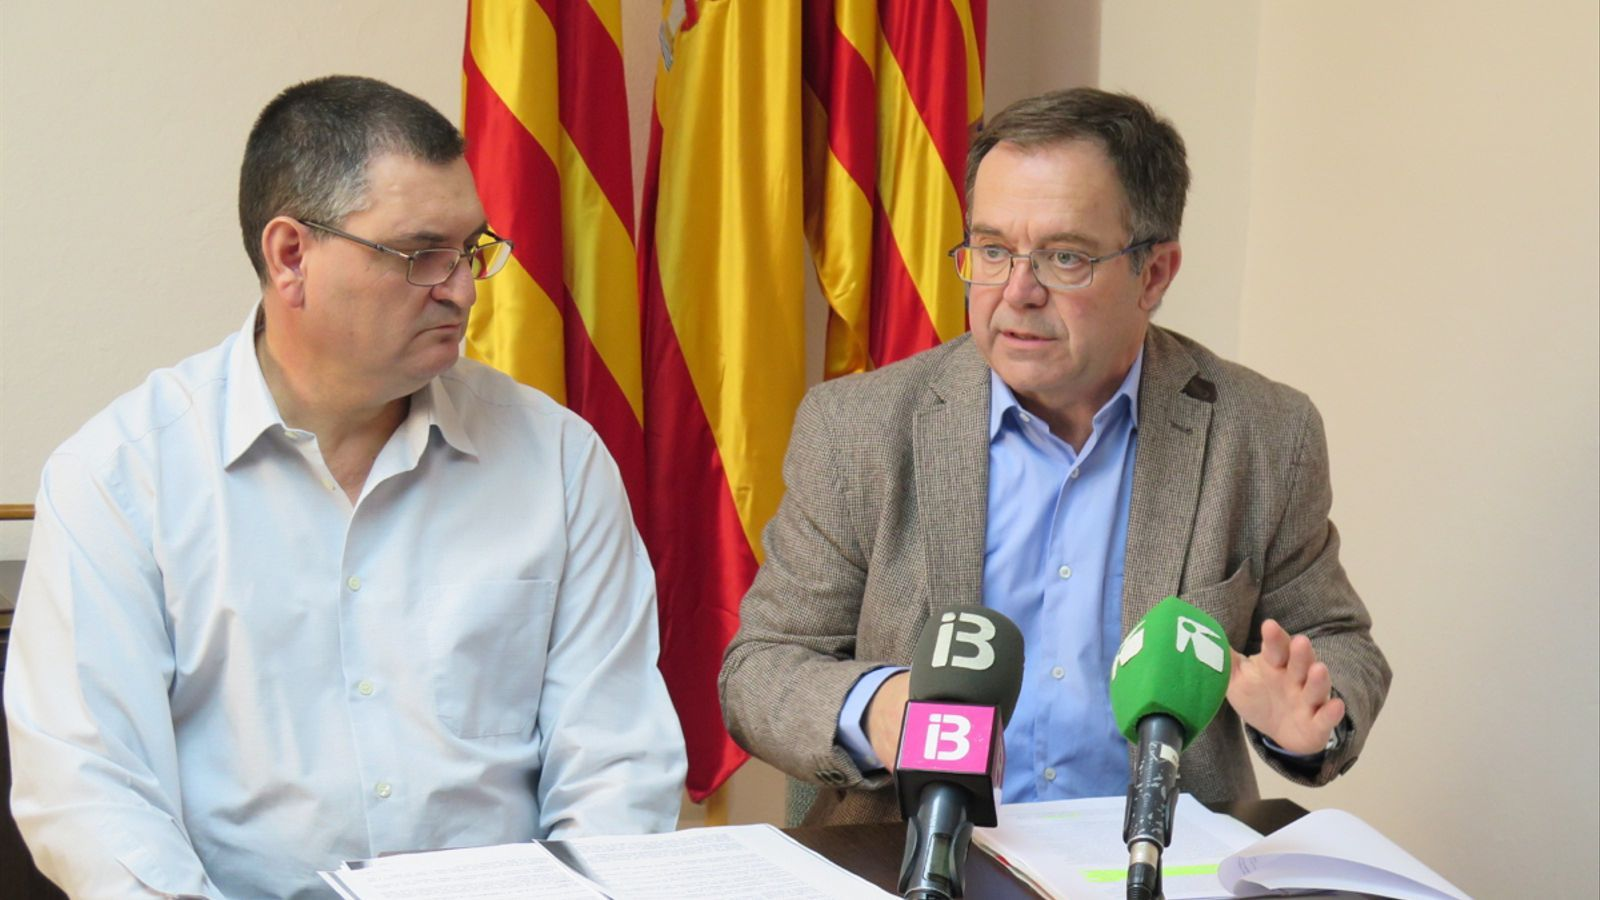 El regidor d'Urbanisme, Àngel Lluís Guerrero junt al batle Josep Marí 'Agustinet'